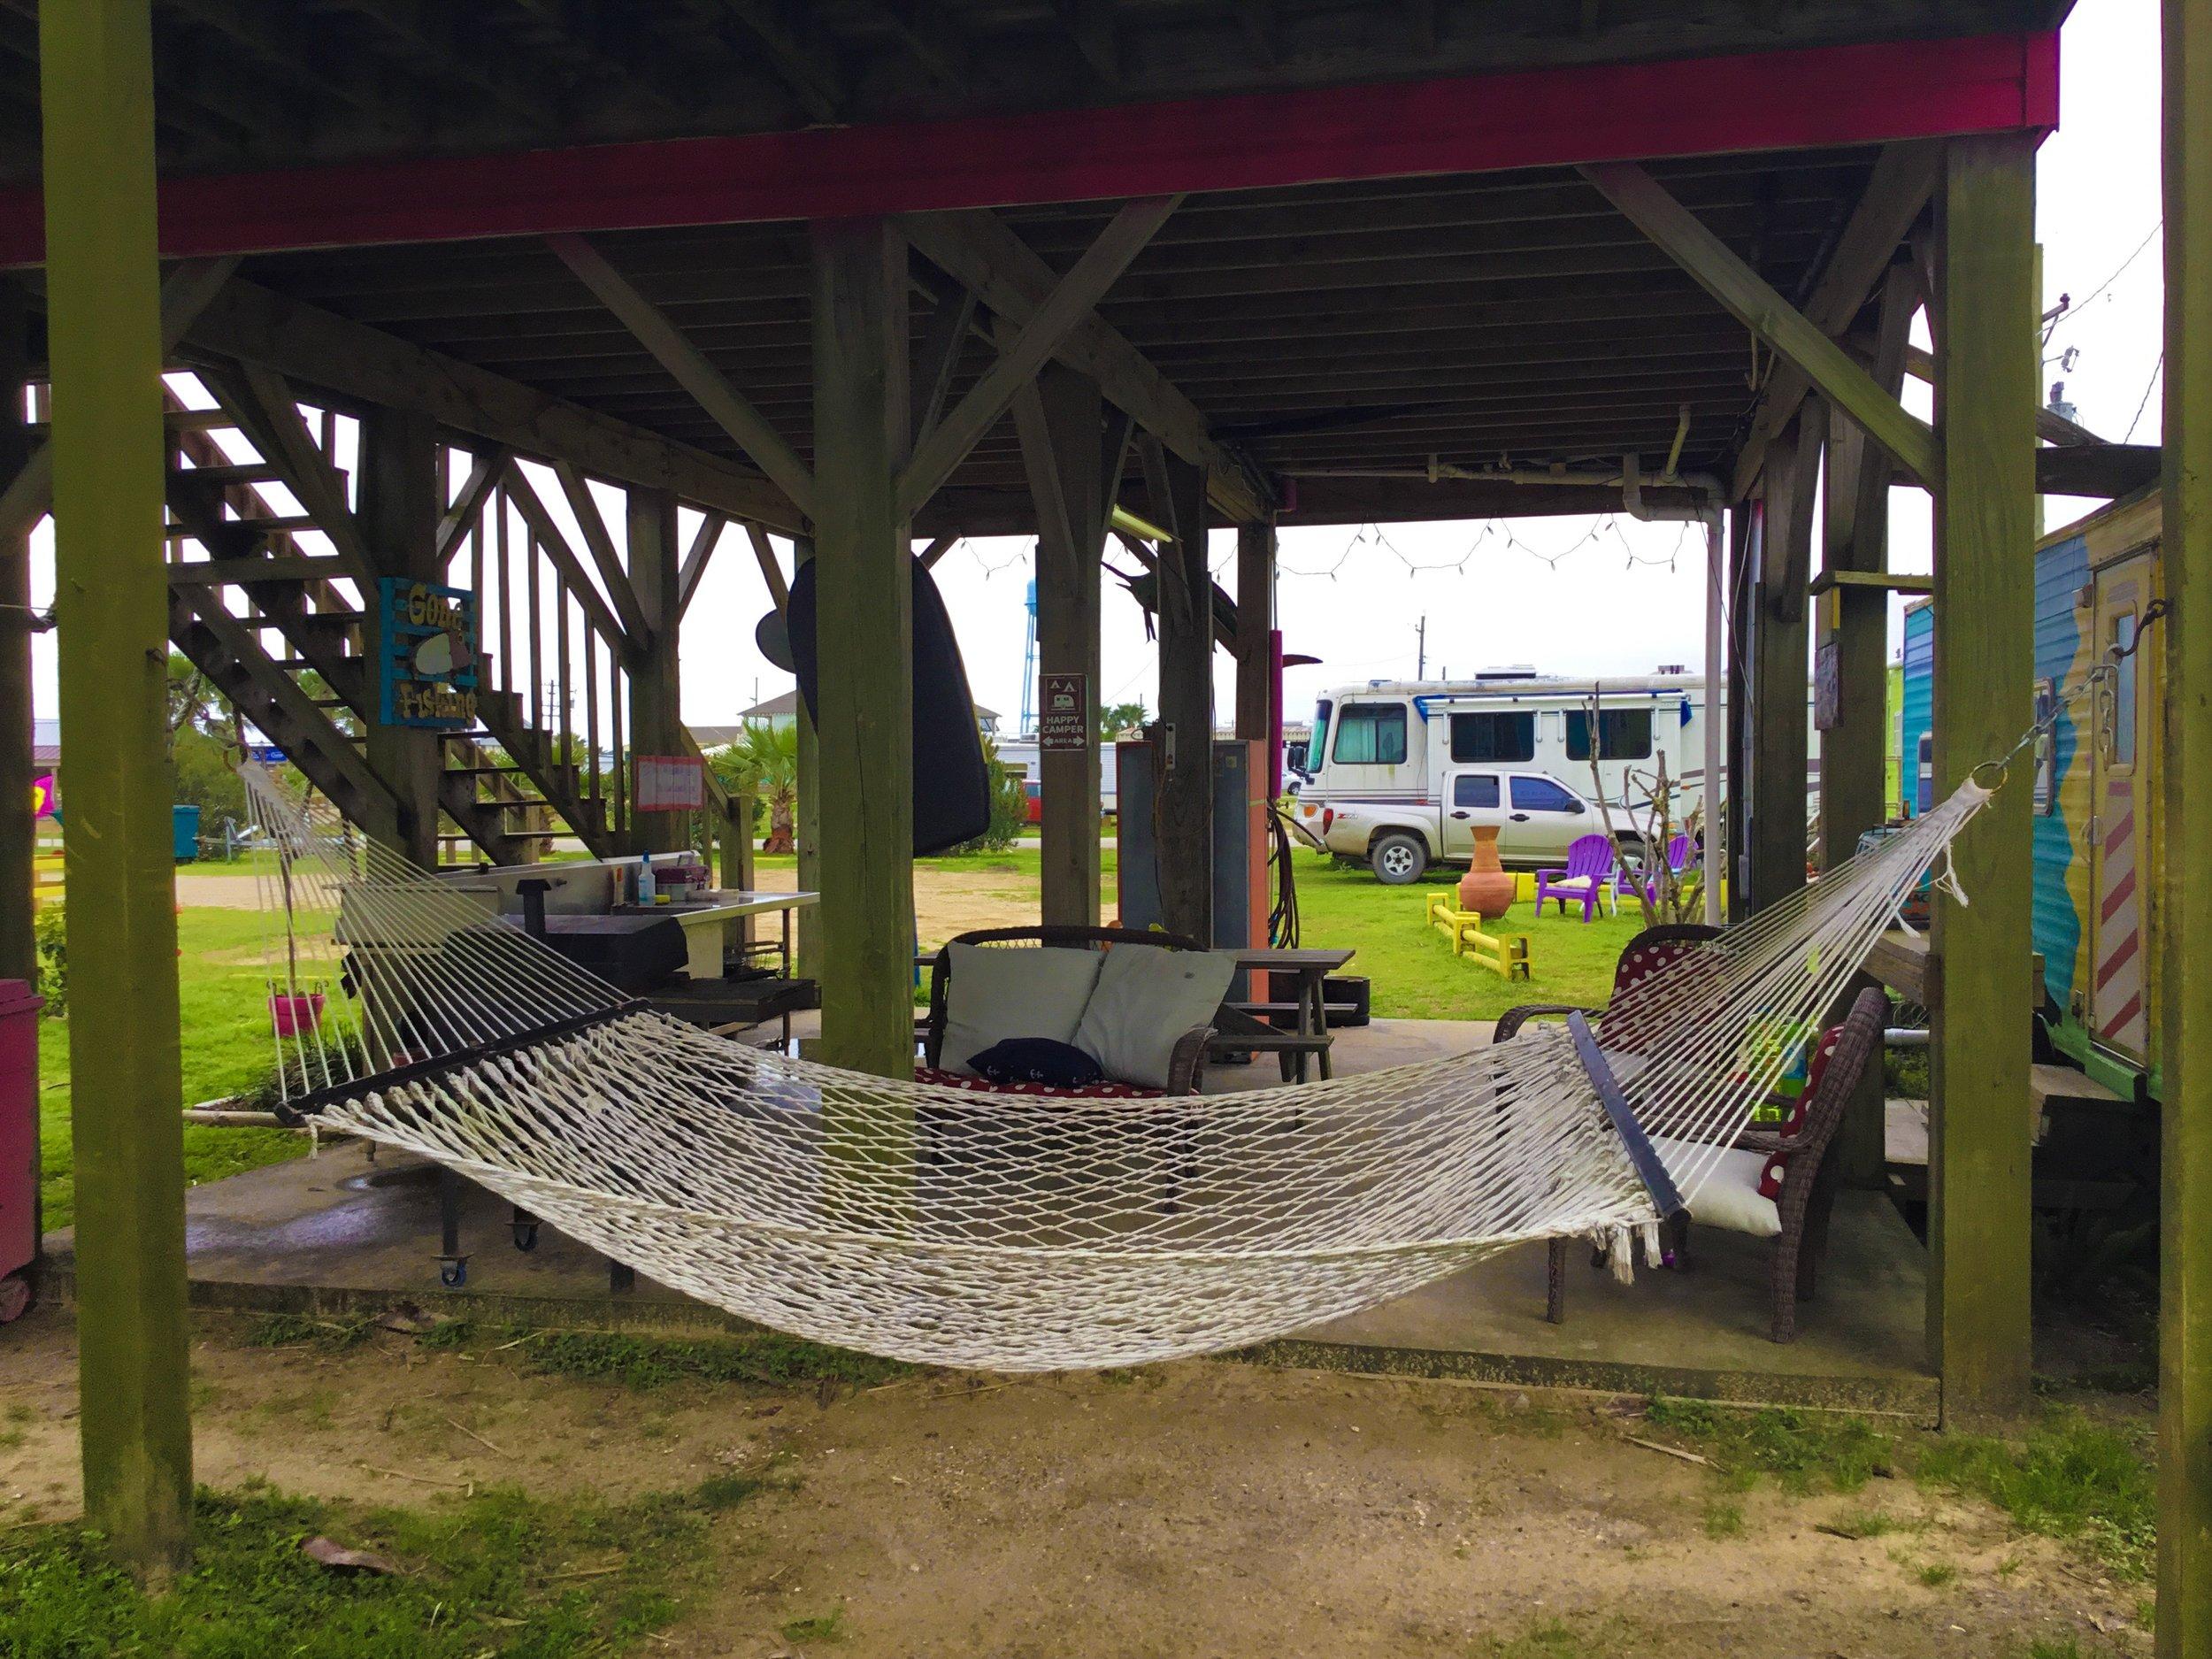 Plenty of hammocks too!